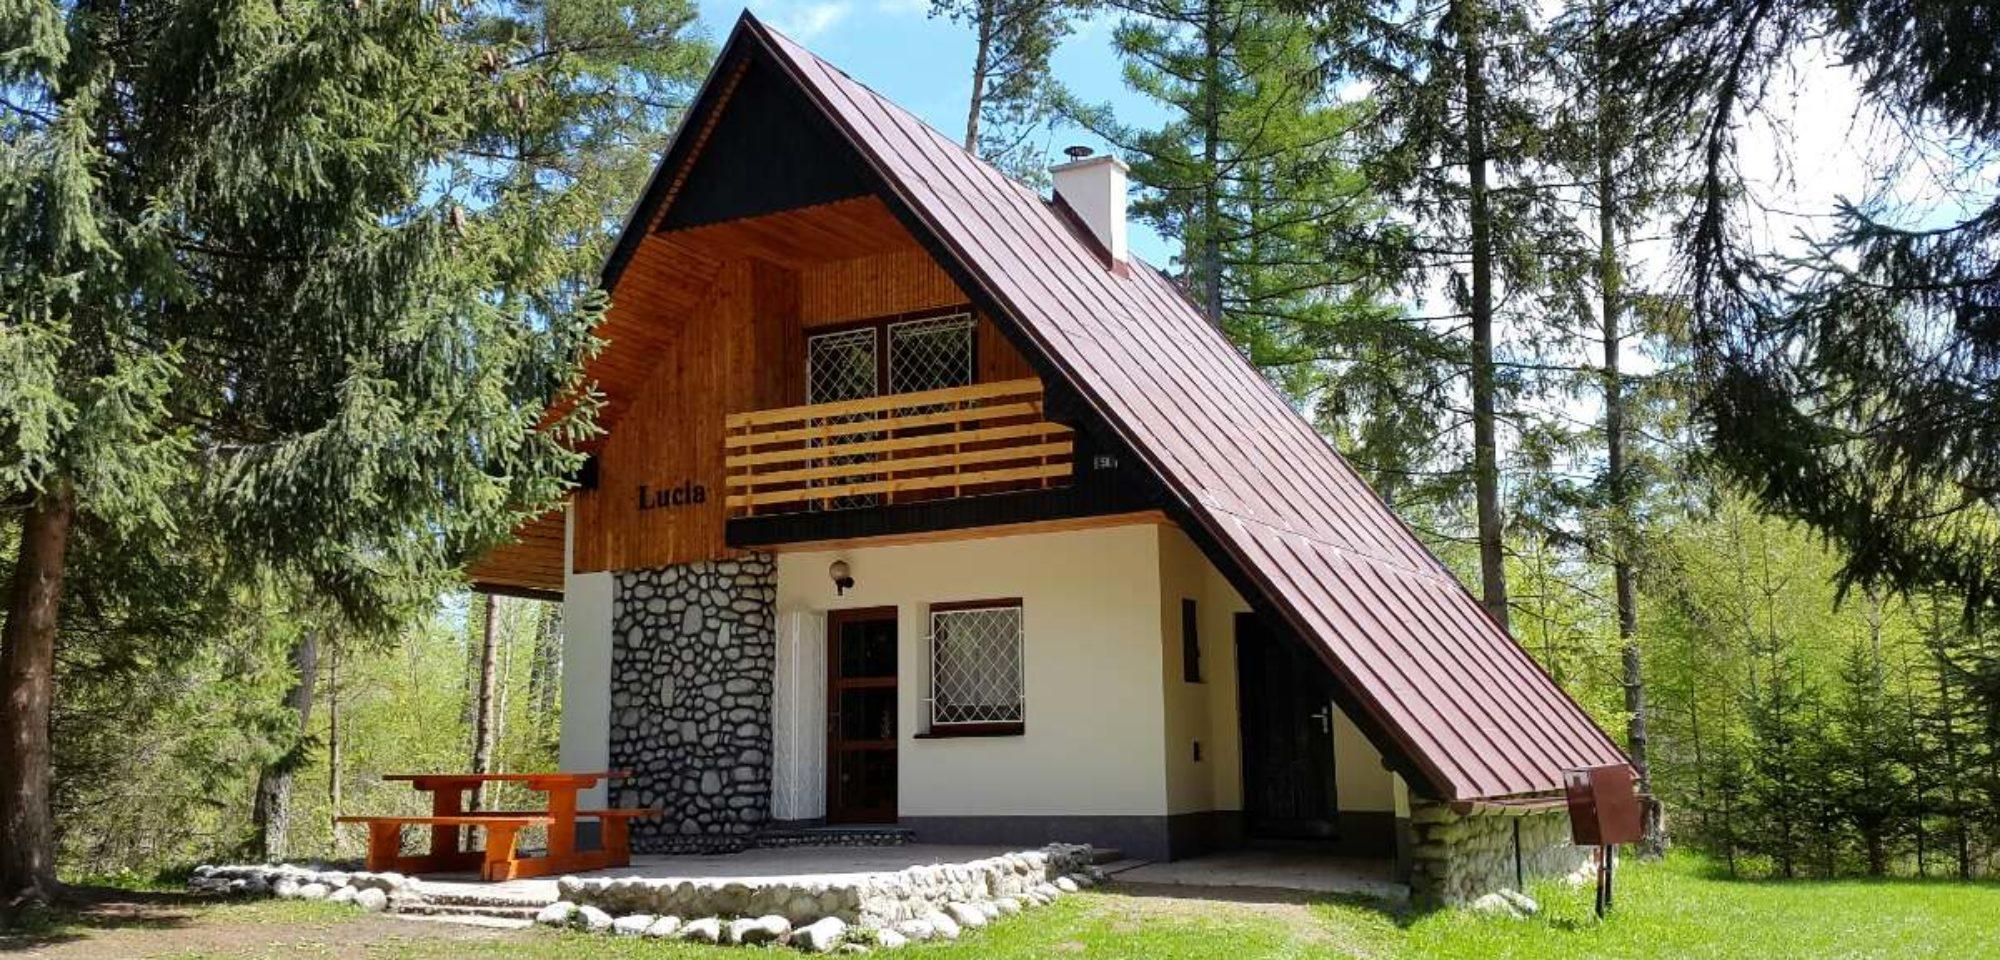 Cottage Lucia